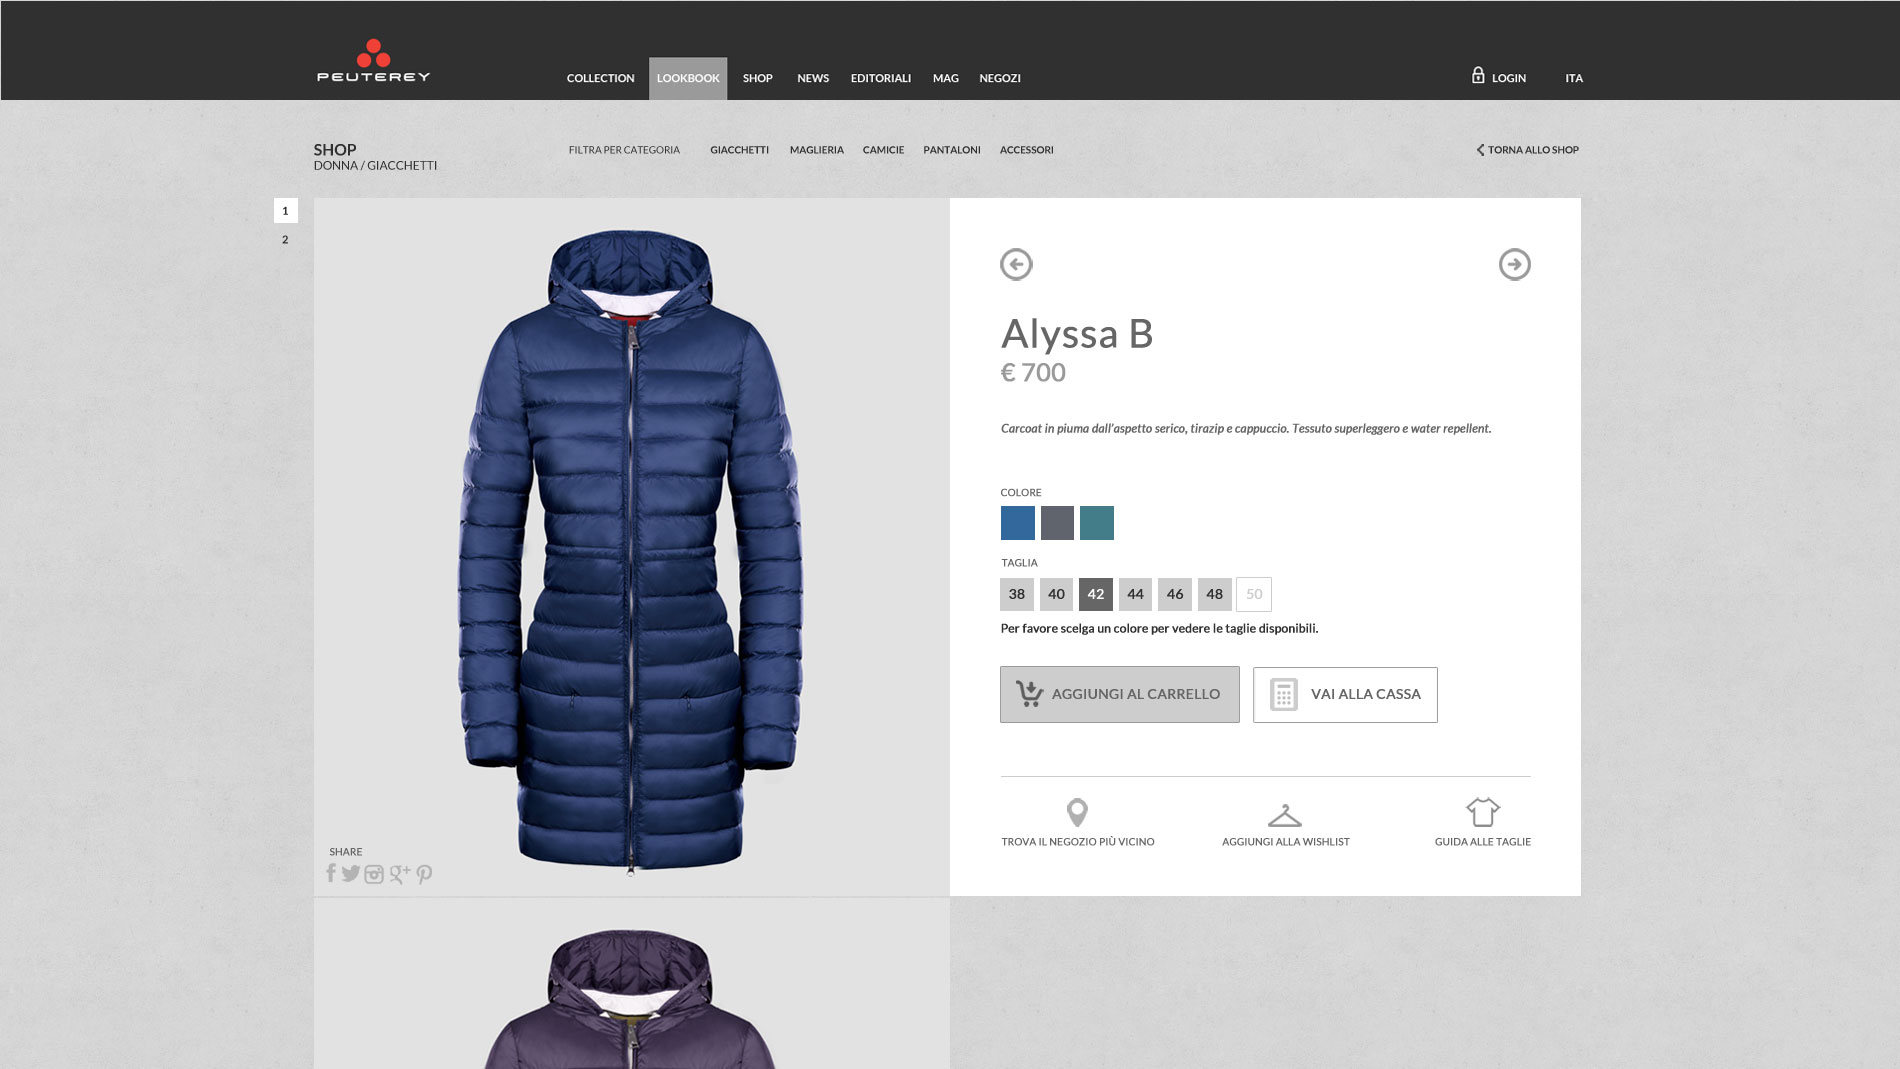 Peuterey e-commerce web design still life